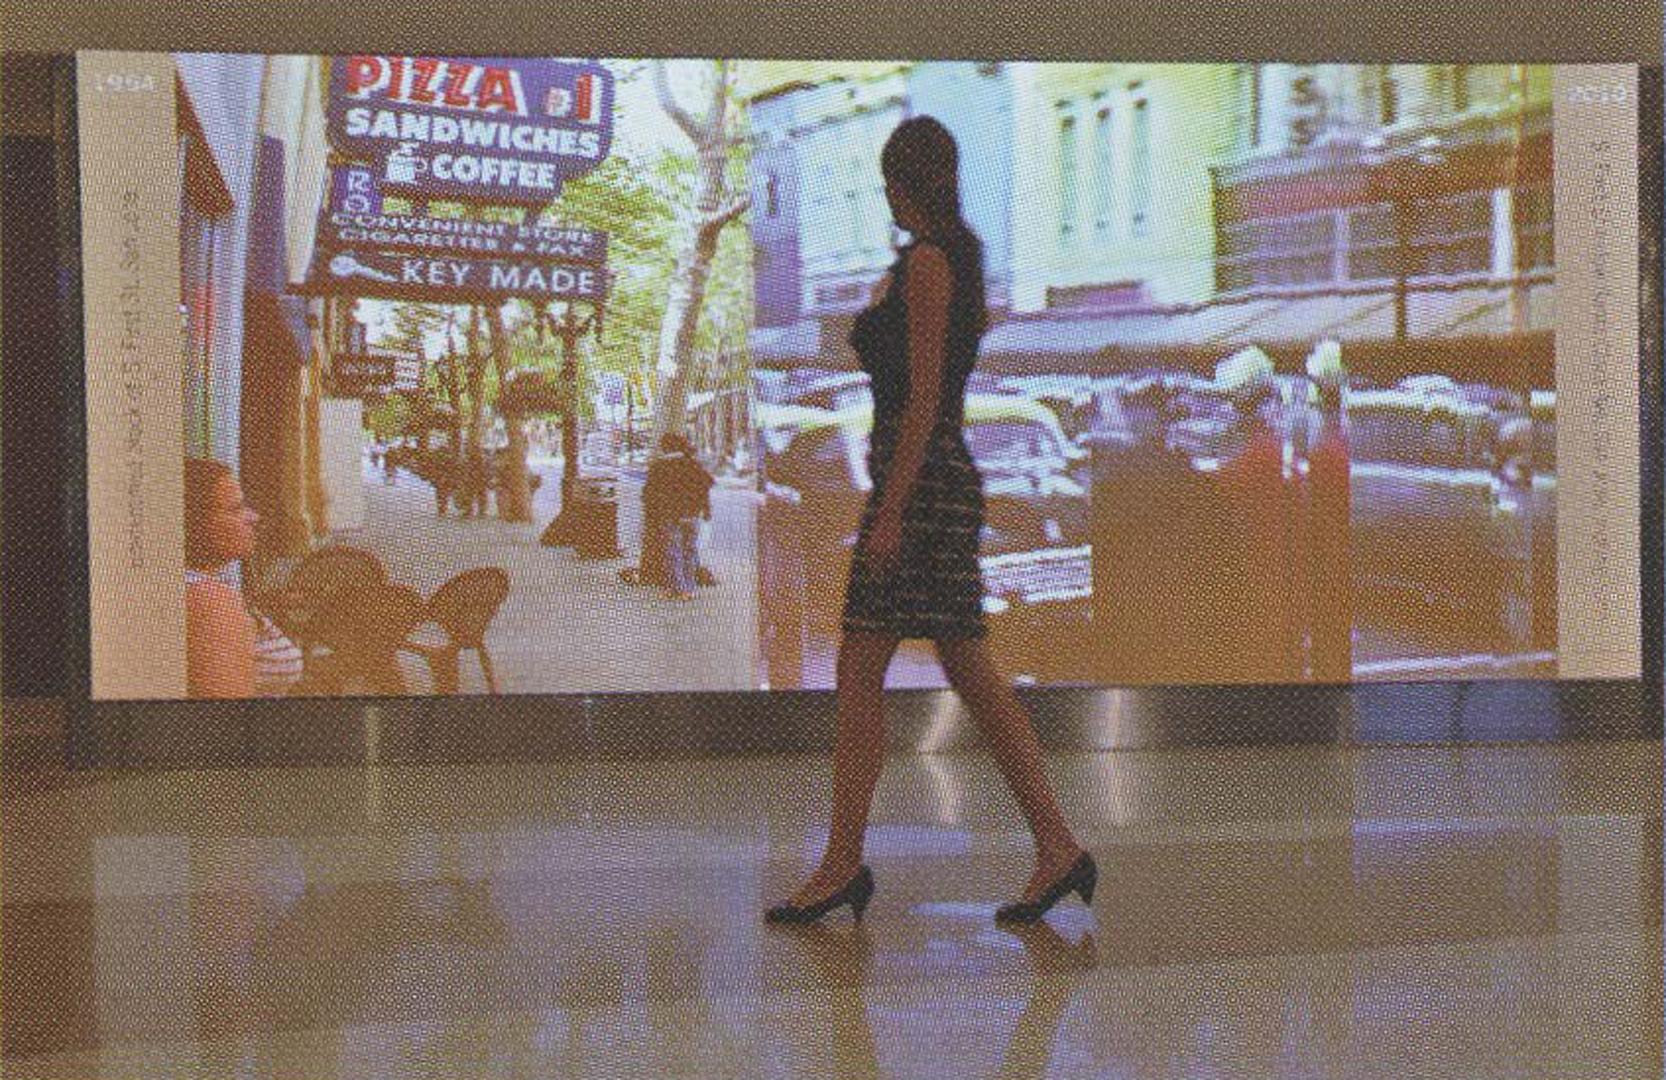 ©2011, Matt Gorbet, Susan LK Gorbet, and Banny Banerjee, Collaboration with the Future